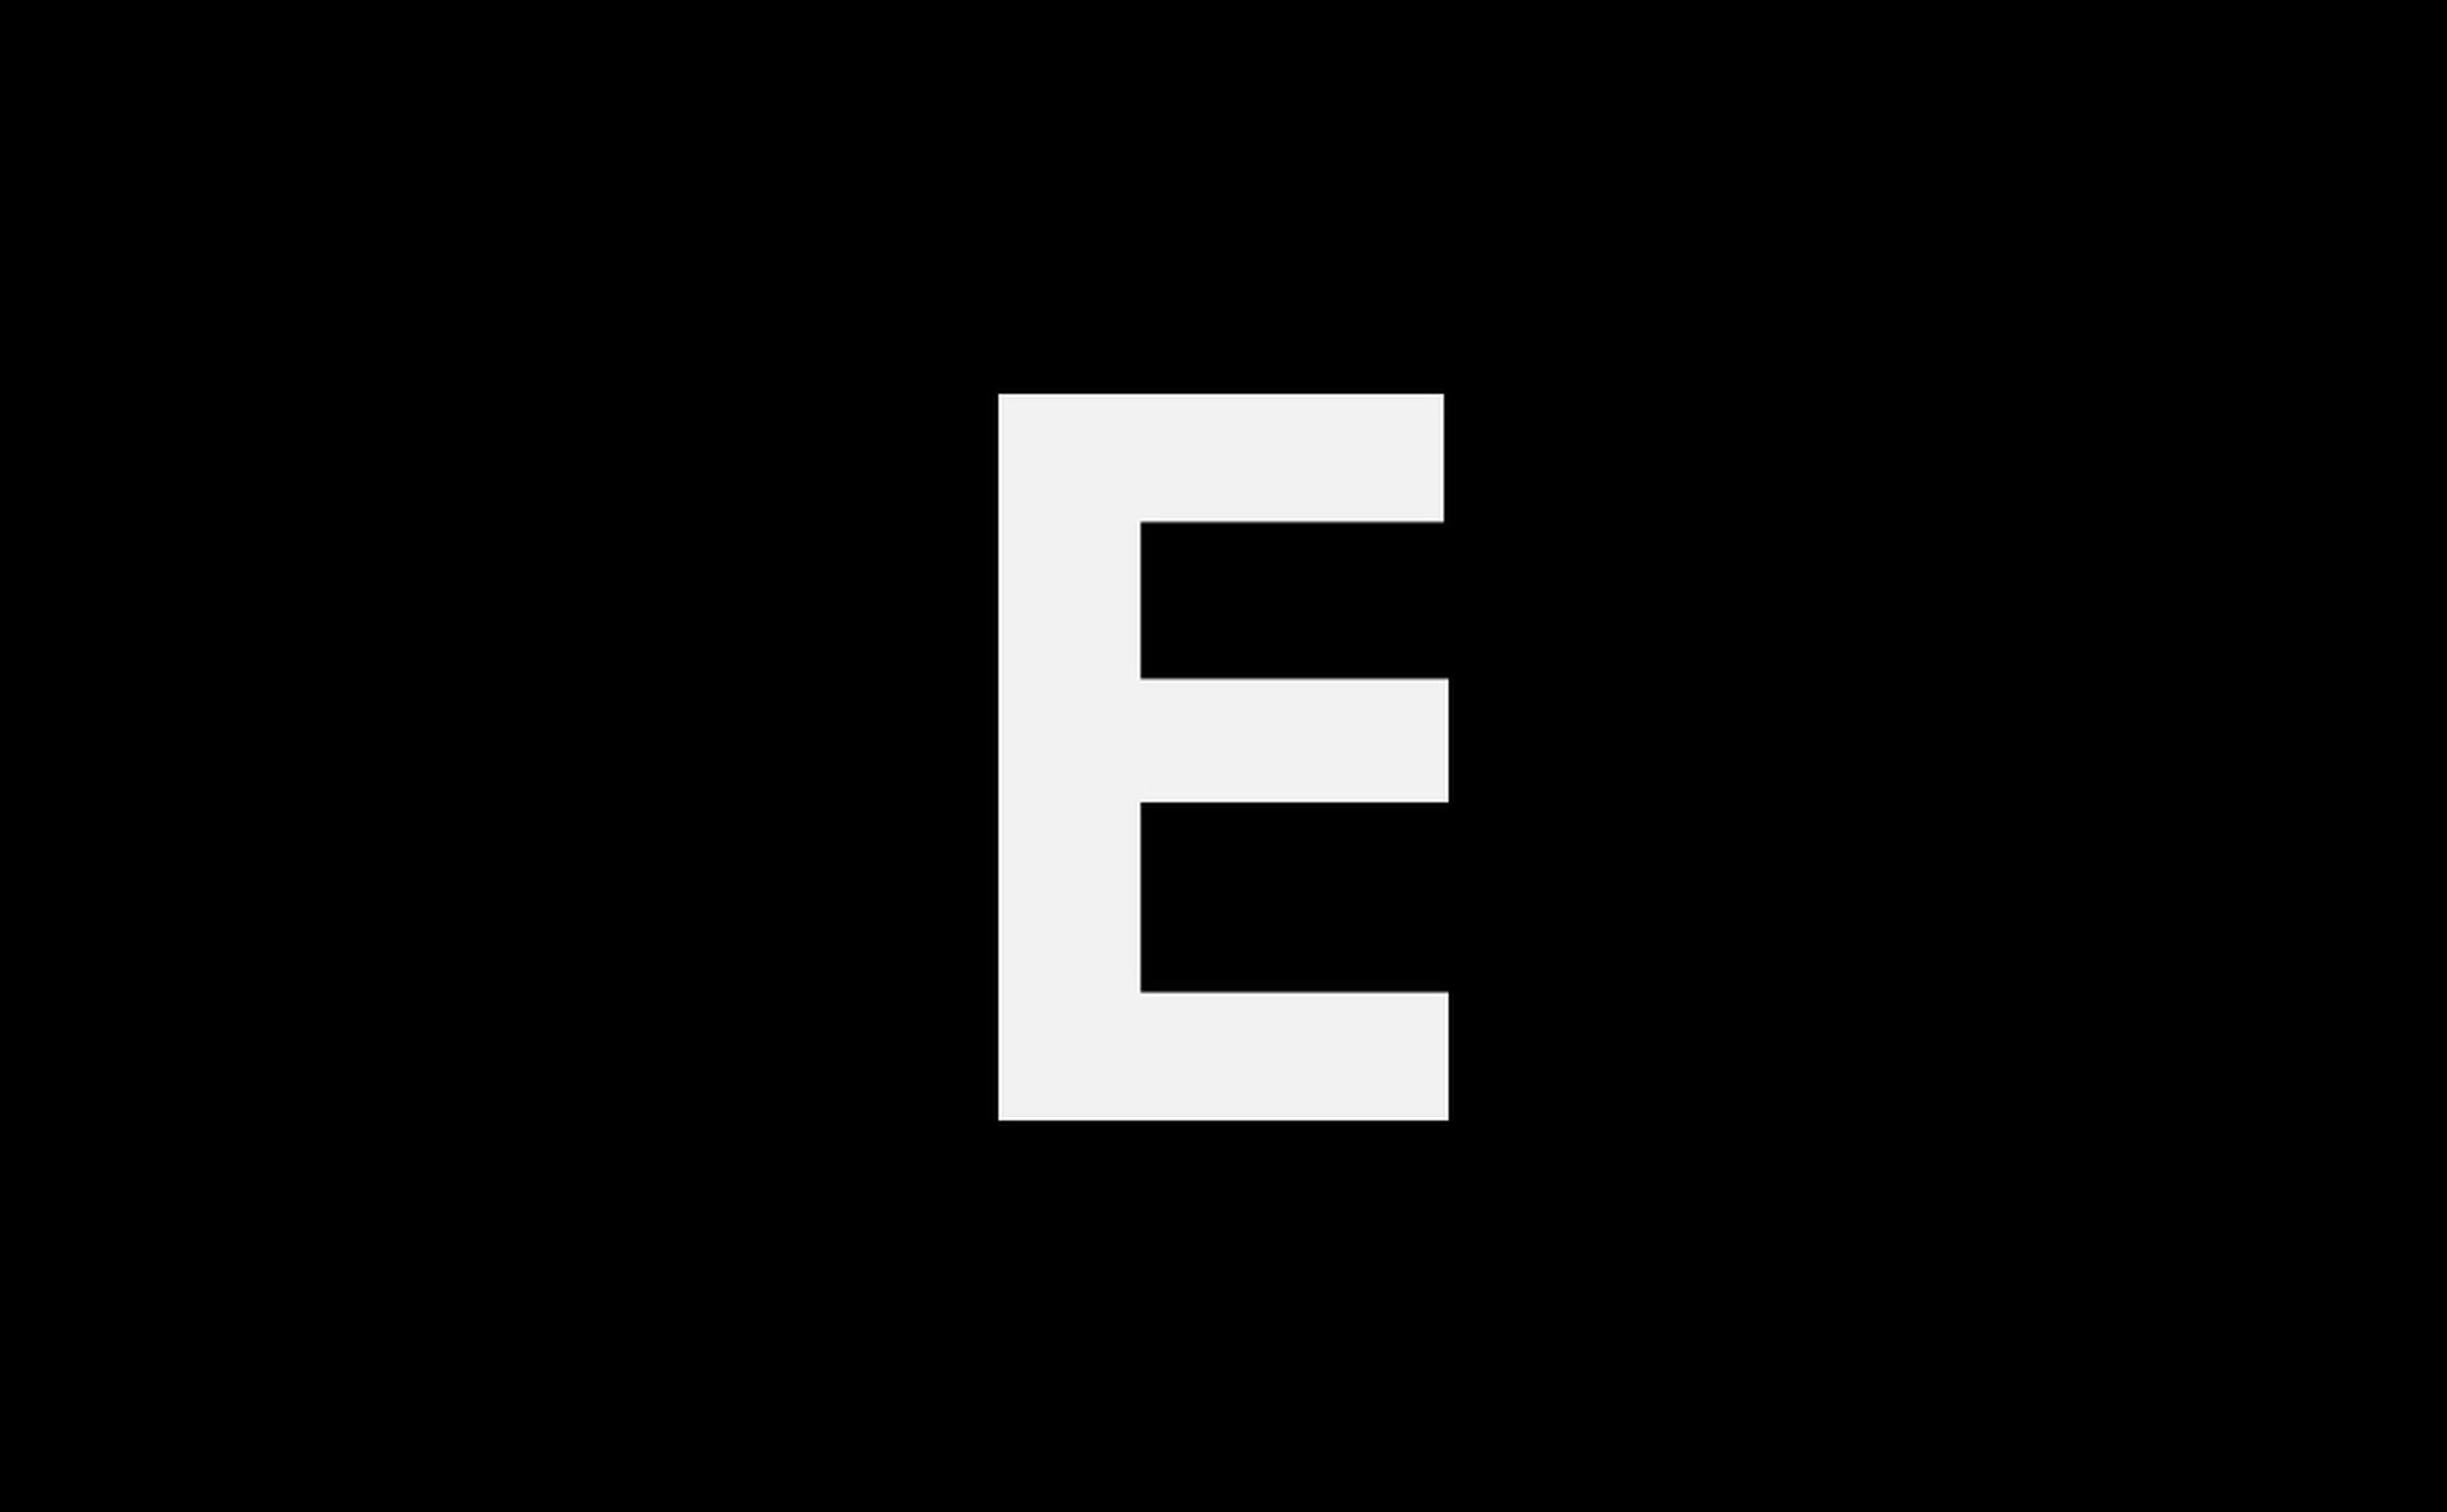 Close-up of traffic light